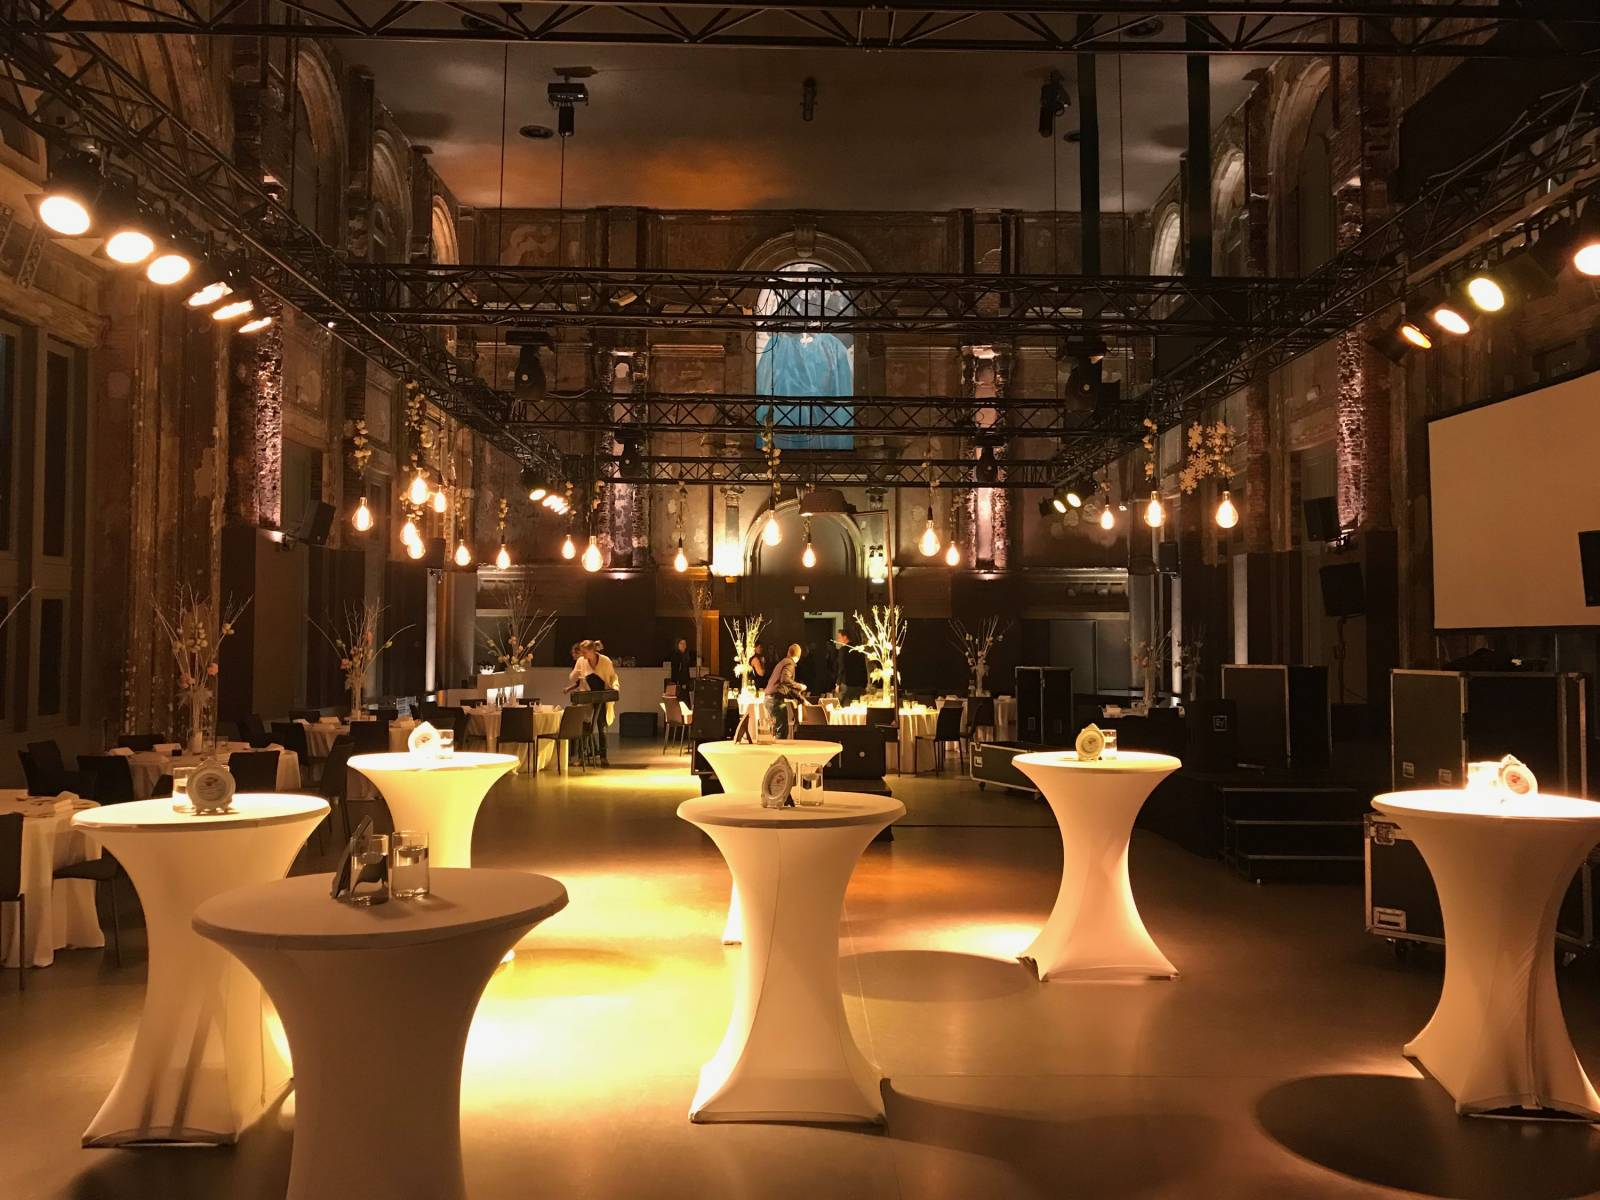 Zaal AthenA - Feestzaal - Trouwzaal - Antwerpen - House of Weddings - 29